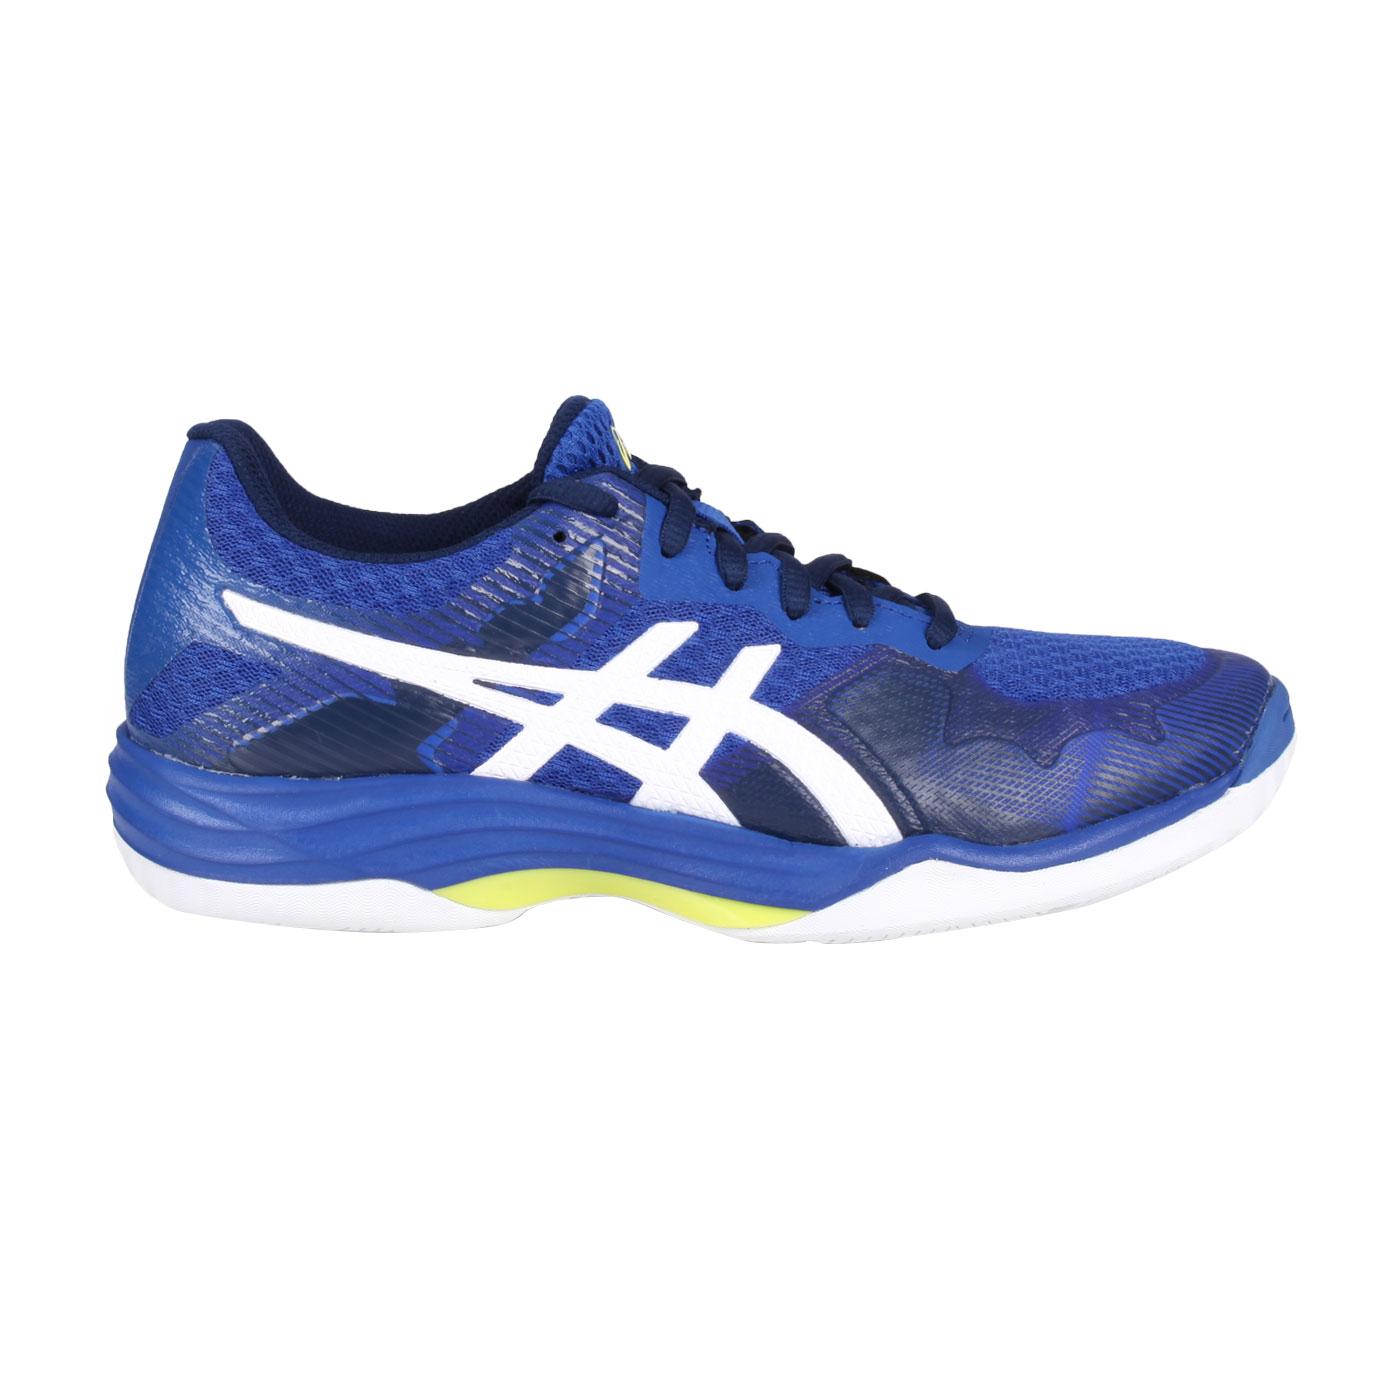 ASICS 女款排羽球鞋  @GEL-TACTIC@1072A035-103 - 藍白